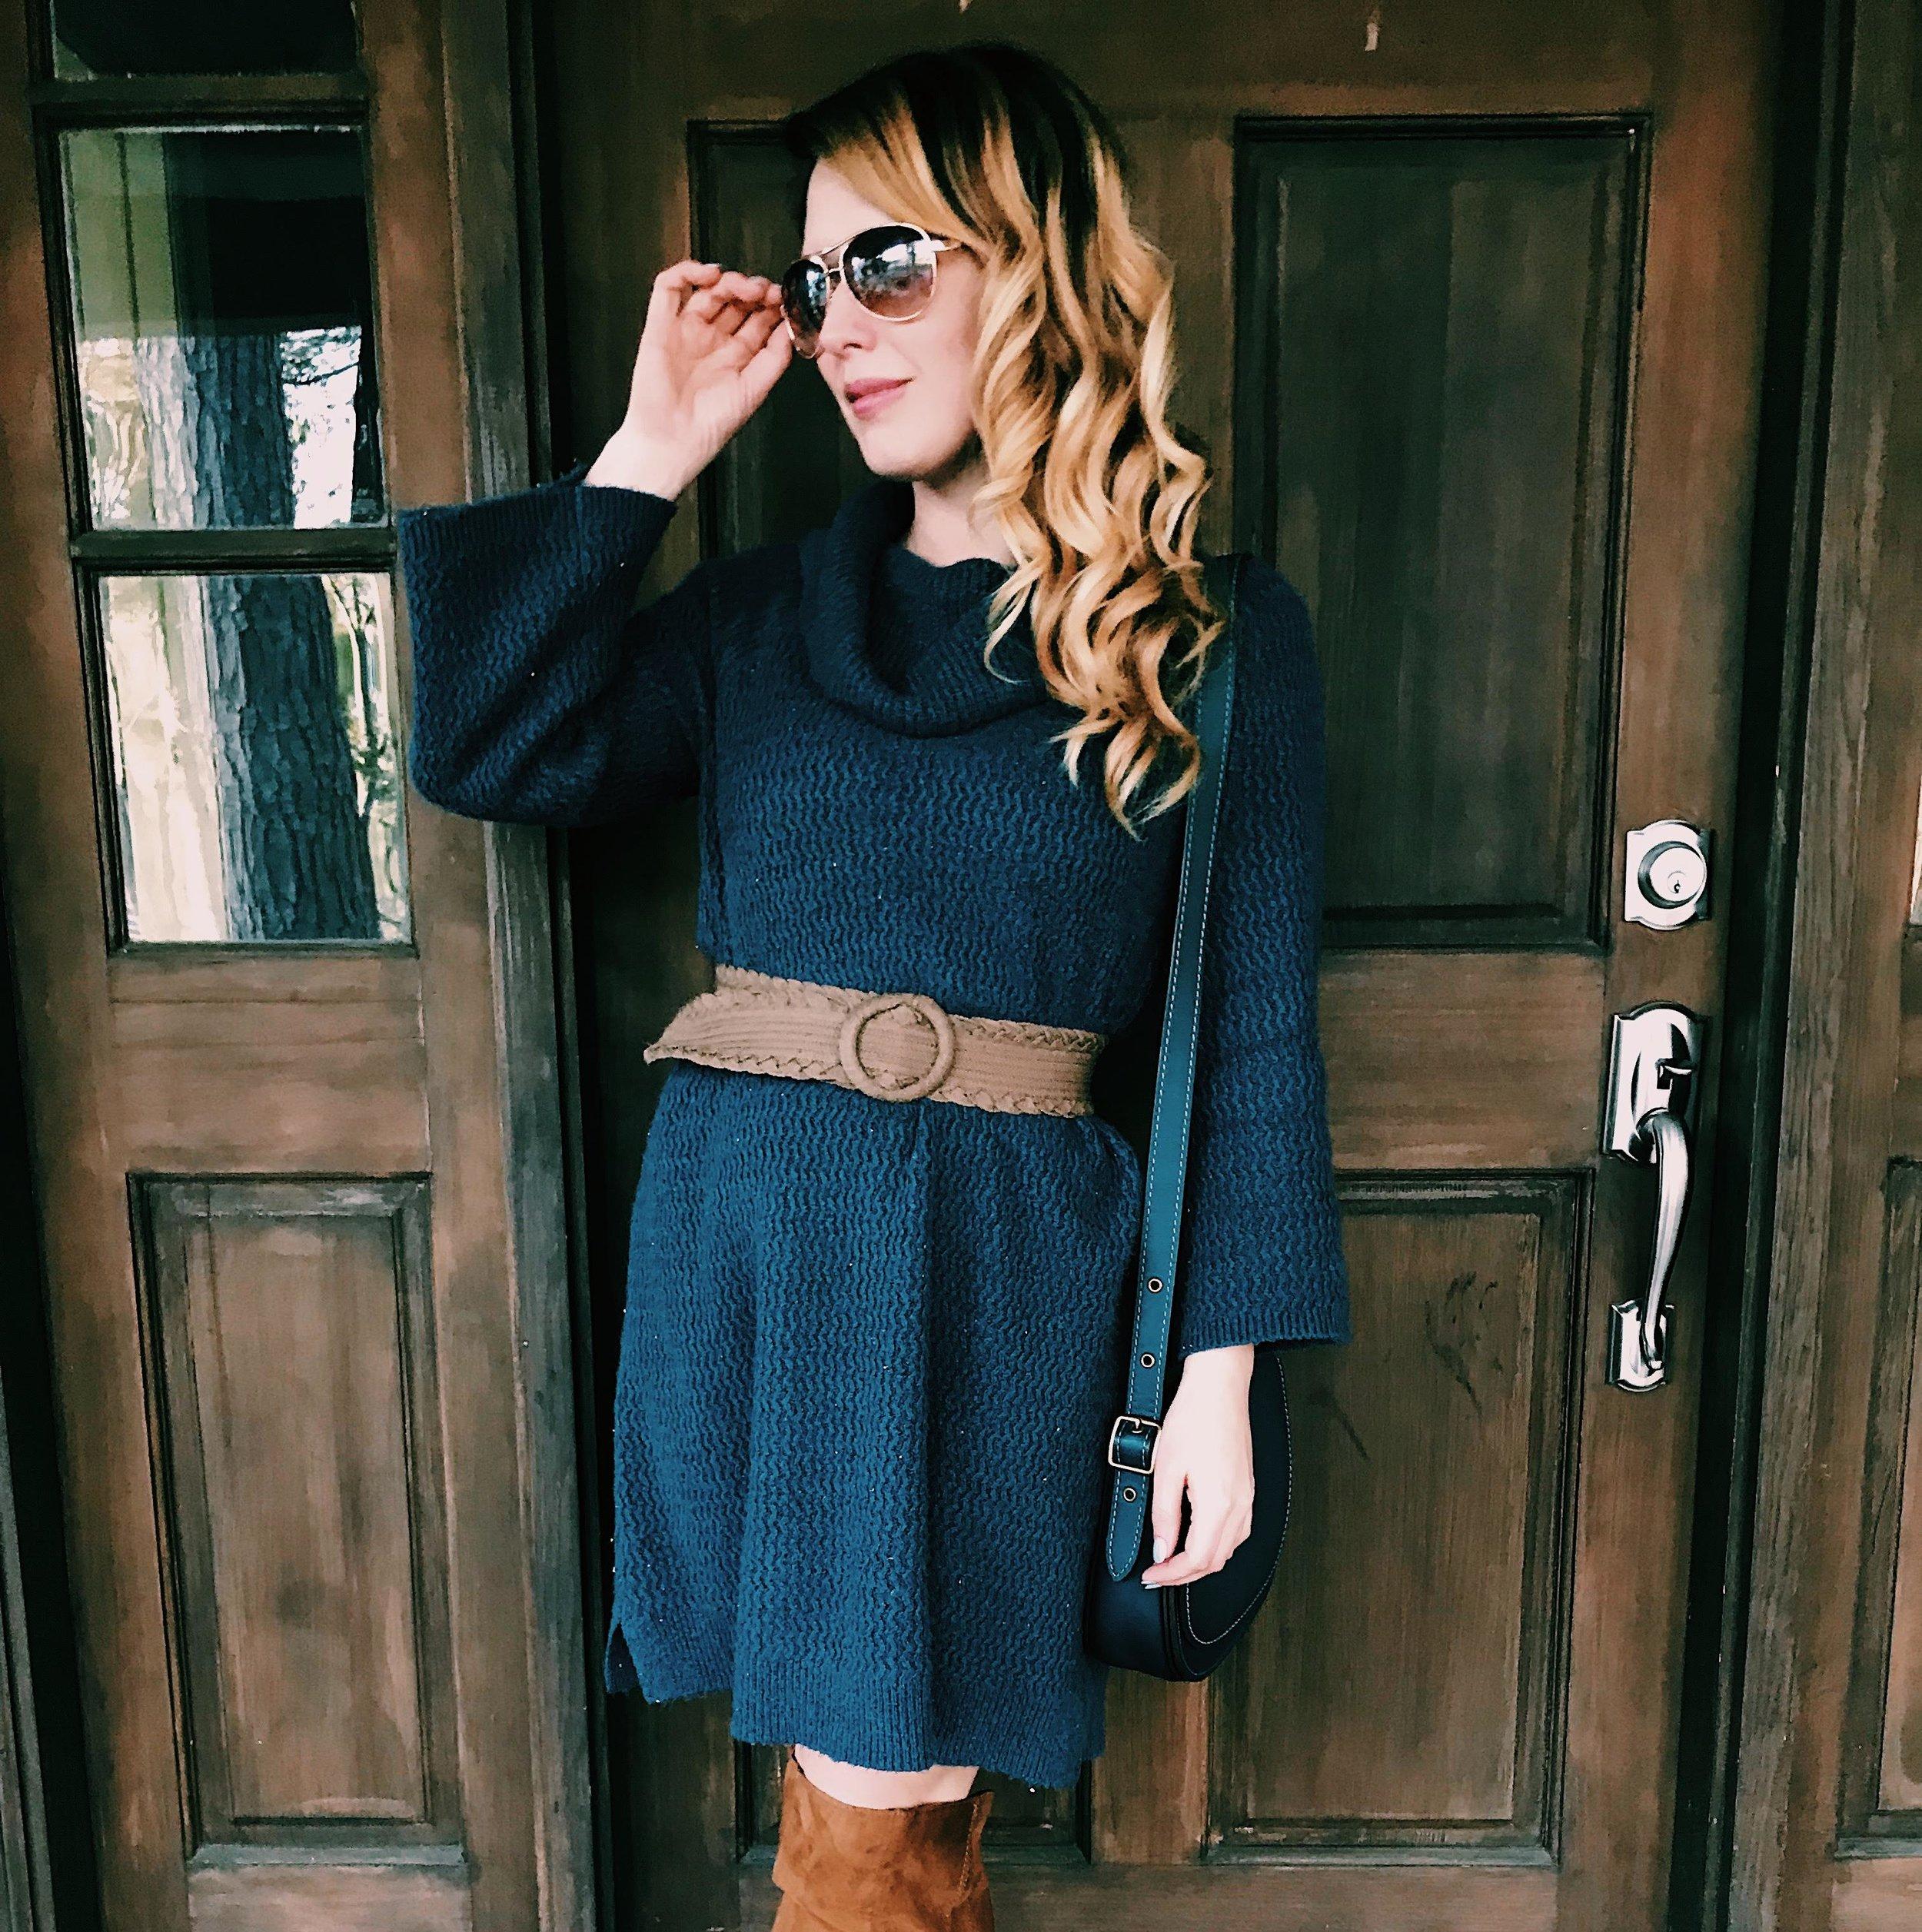 Three Heel Clicks - Styling a Sweater Dress from LOFT (21).jpg